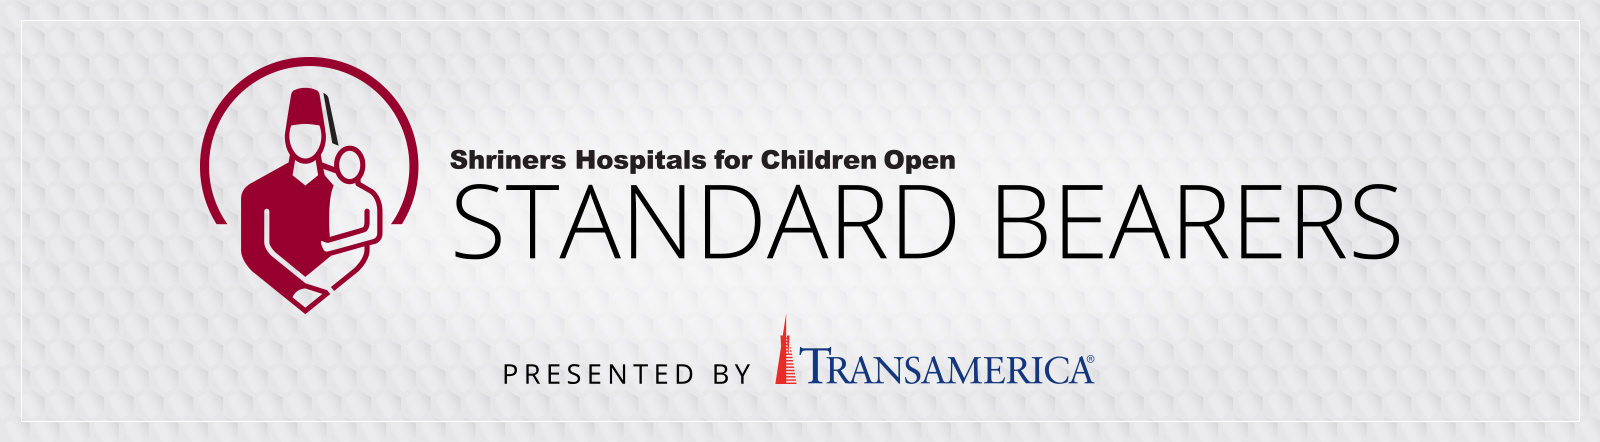 Fundraising for Shriners Hospitals for Children